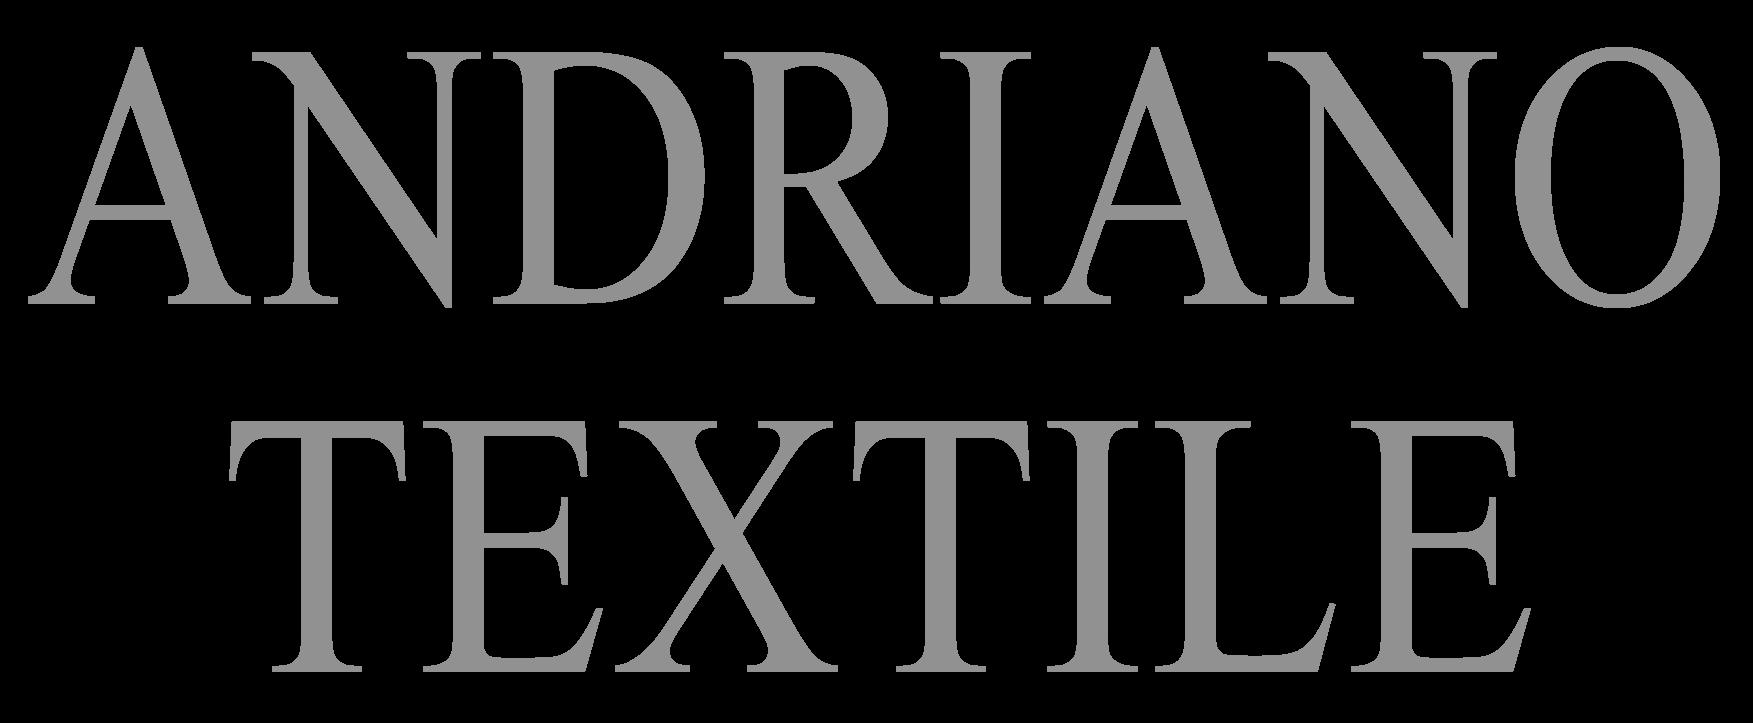 Andriano Textile